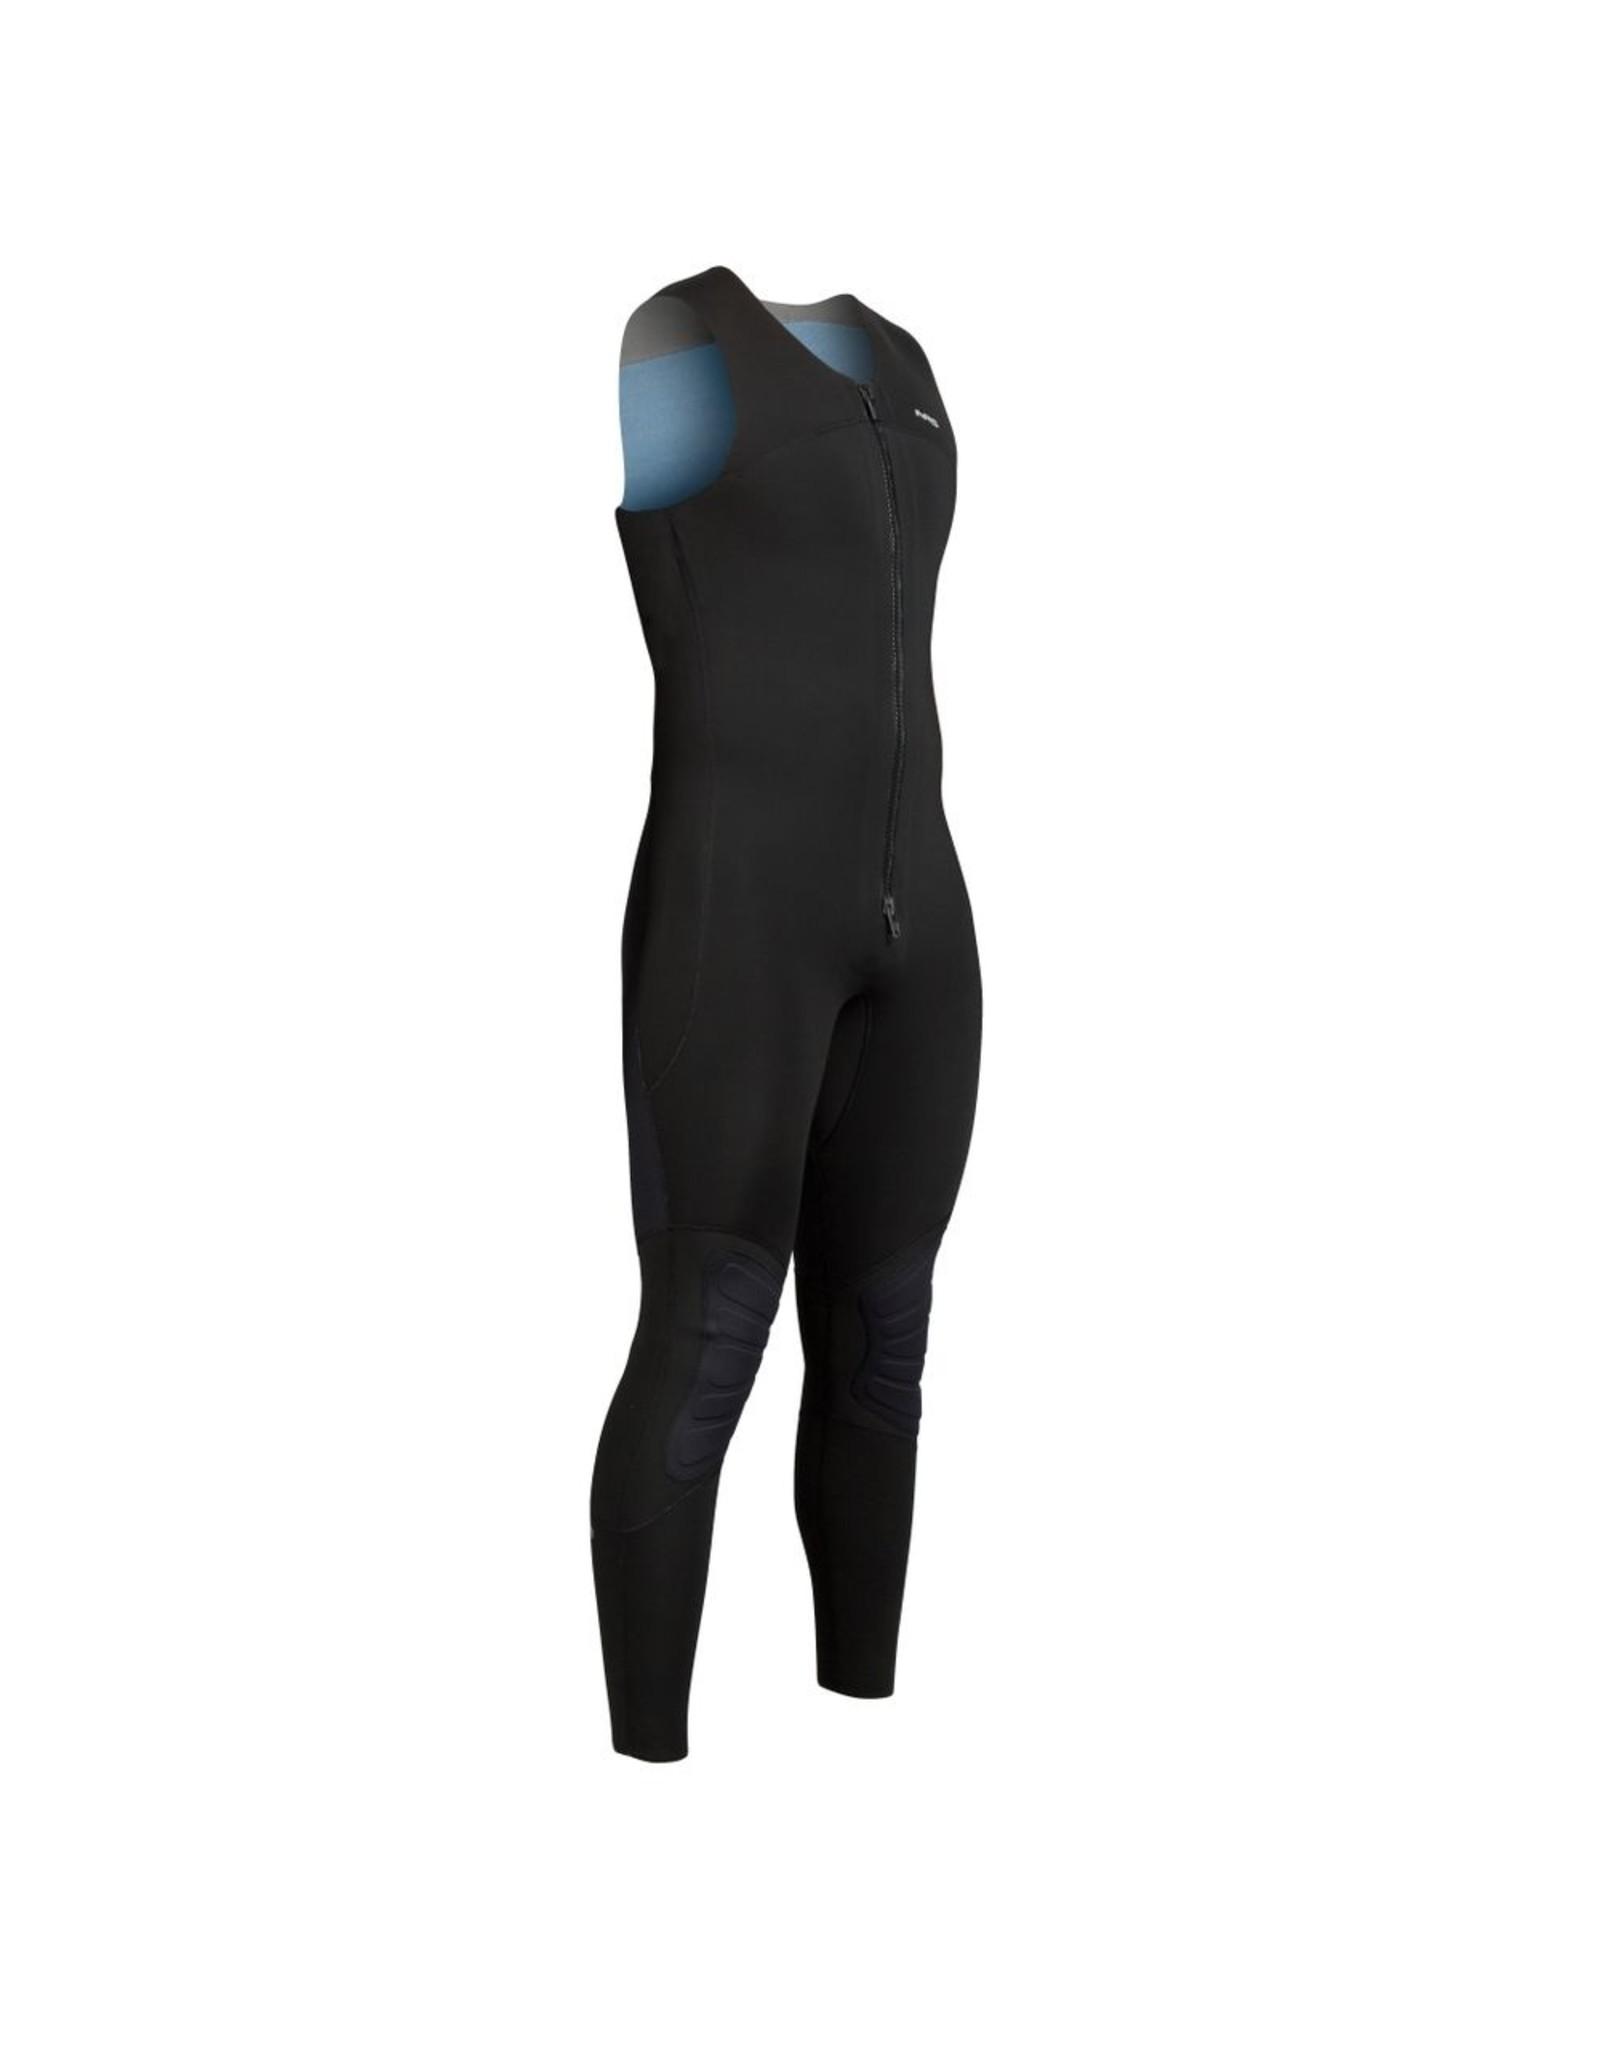 NRS NRS Farmer John 3mm Small Wetsuit (LIQUIDATION)